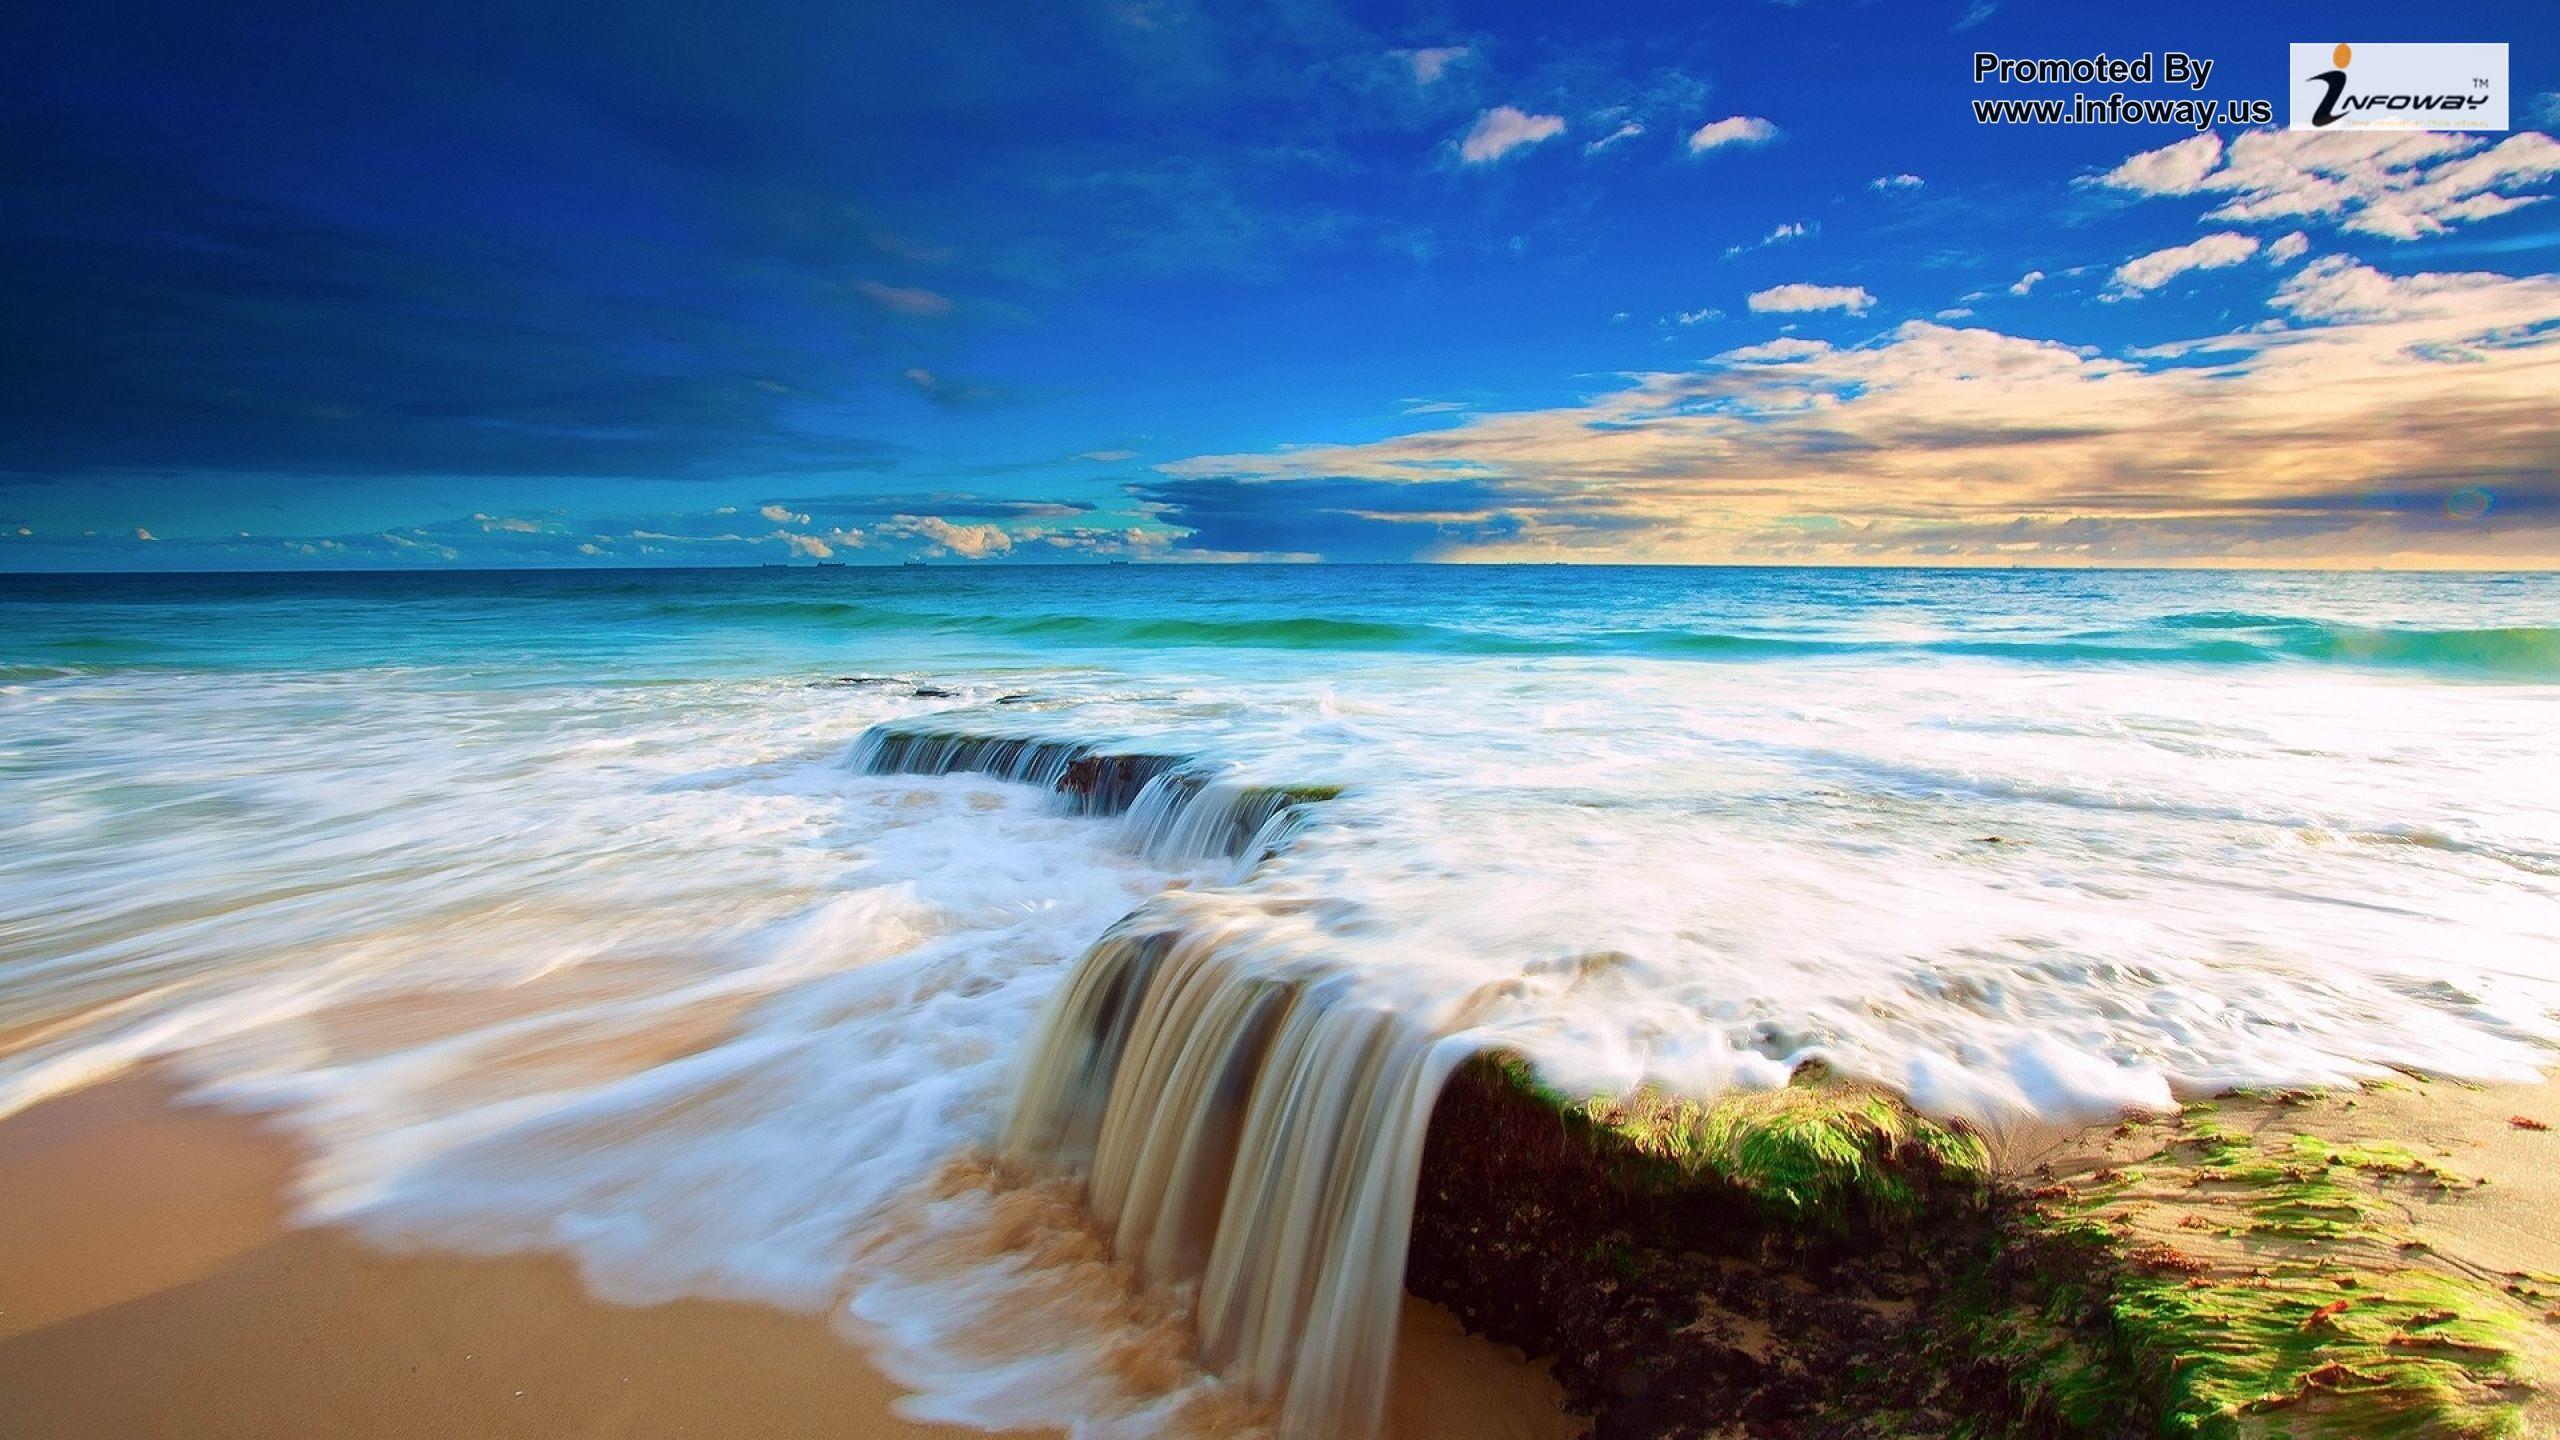 water ocean clouds nature be High Resolution Wallpaper 2560x1440